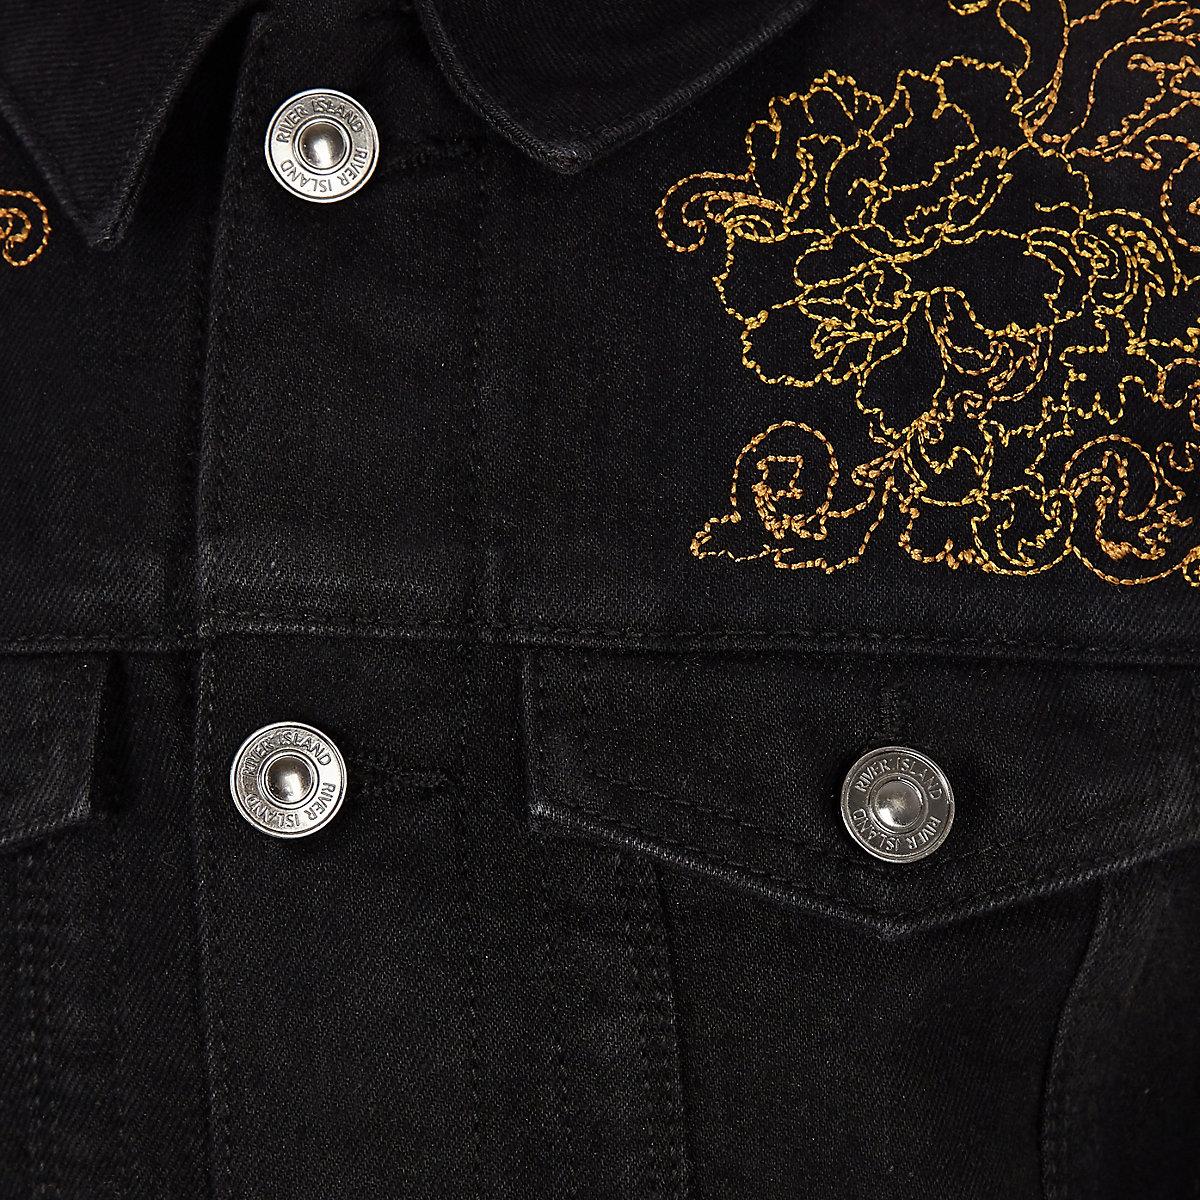 Ri 30 Boys Black Embroidered Denim Jacket Jackets Coats